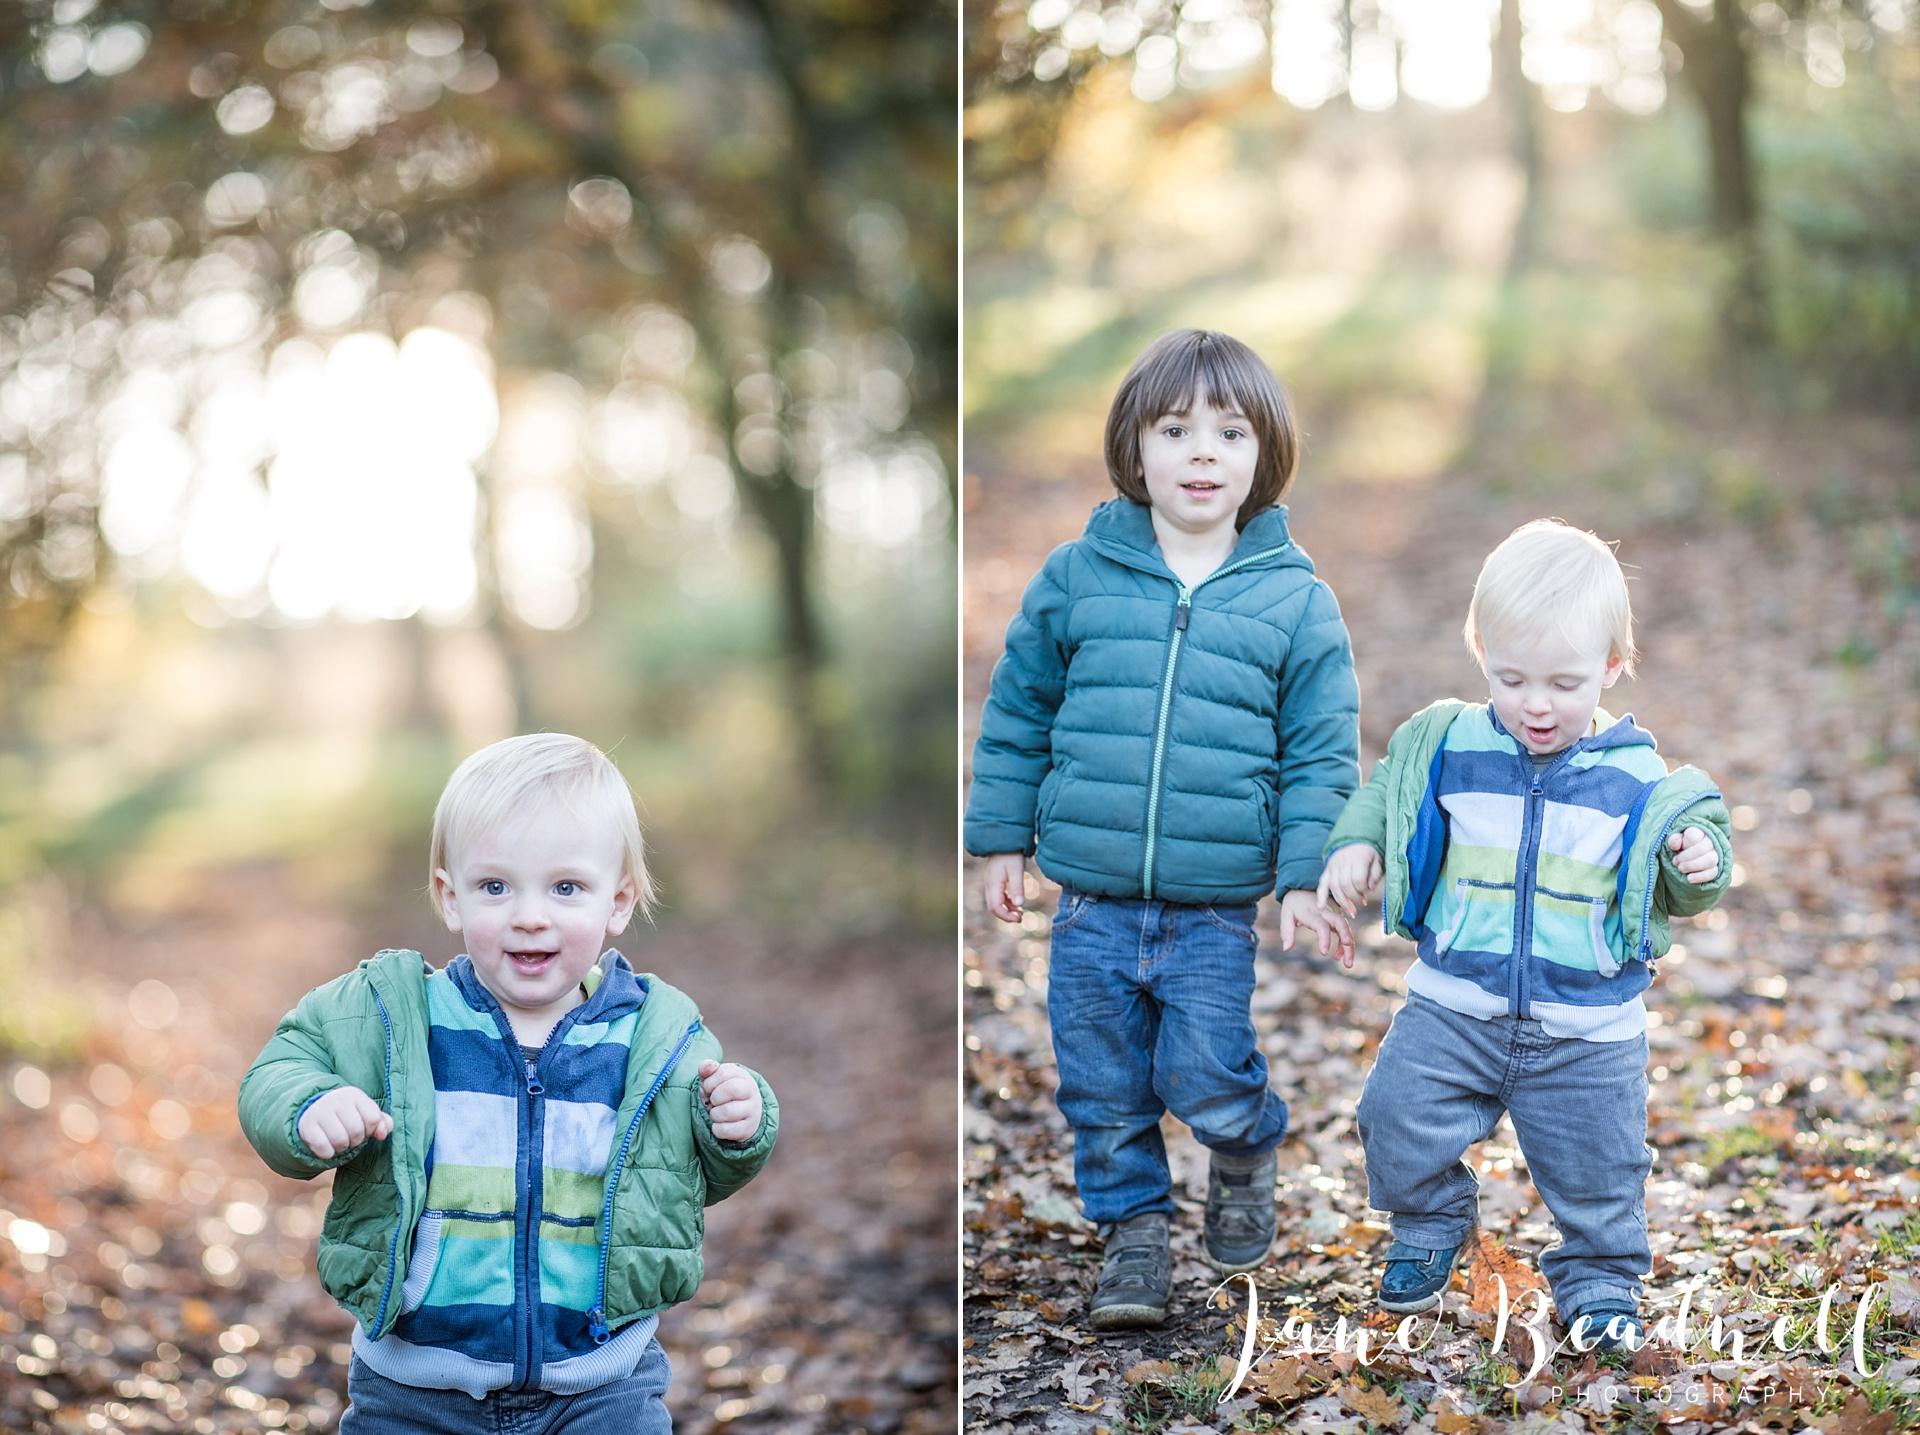 Otley family photographer, Otley portrait photographer, Leeds family photographer Jane Beadnell Photography